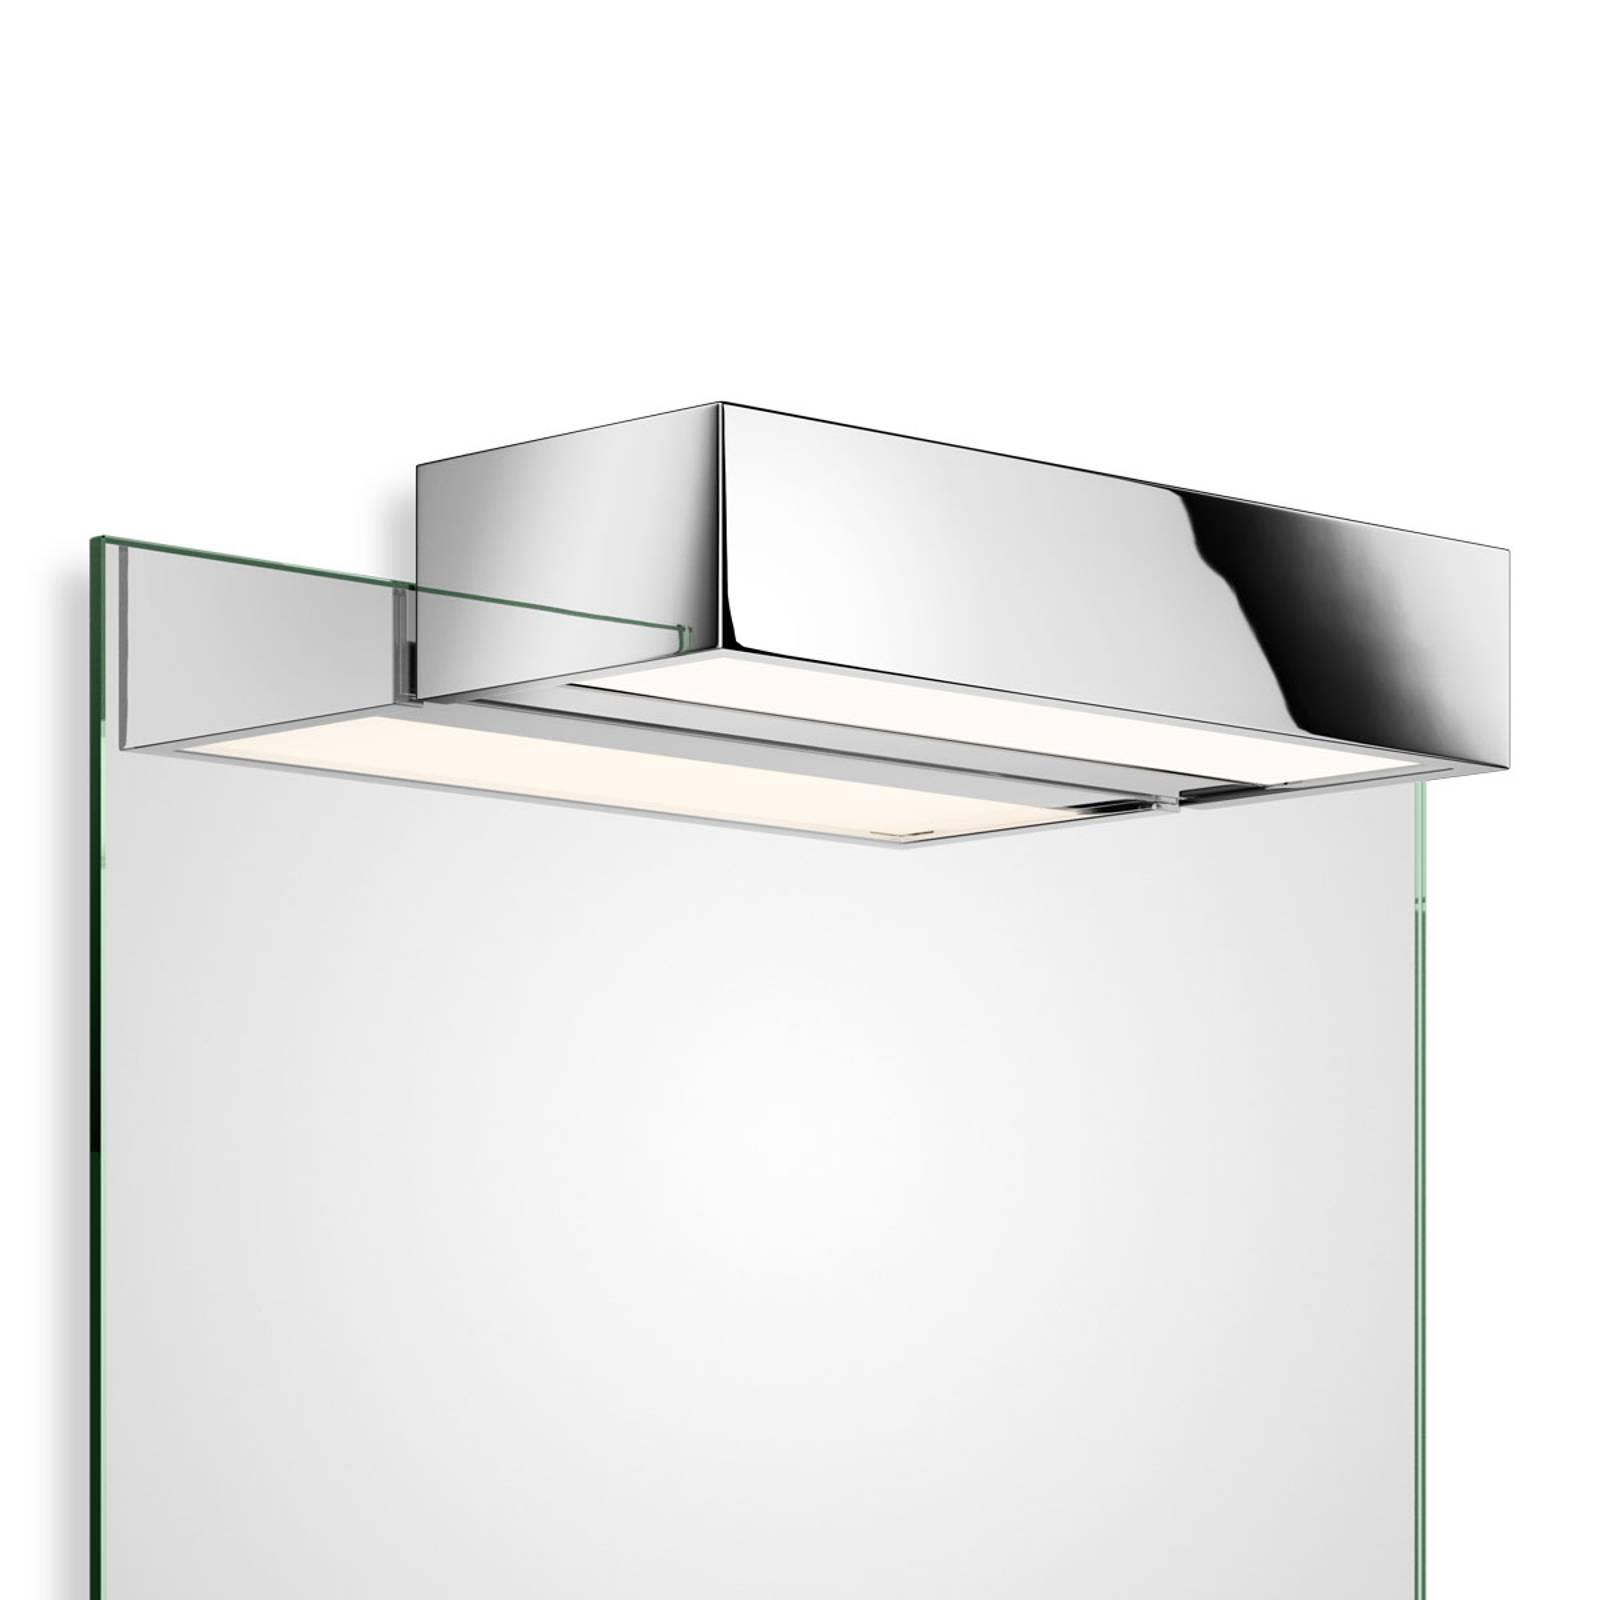 Decor Walther Box 1-15 N -LED-peililamppu 2 700 K